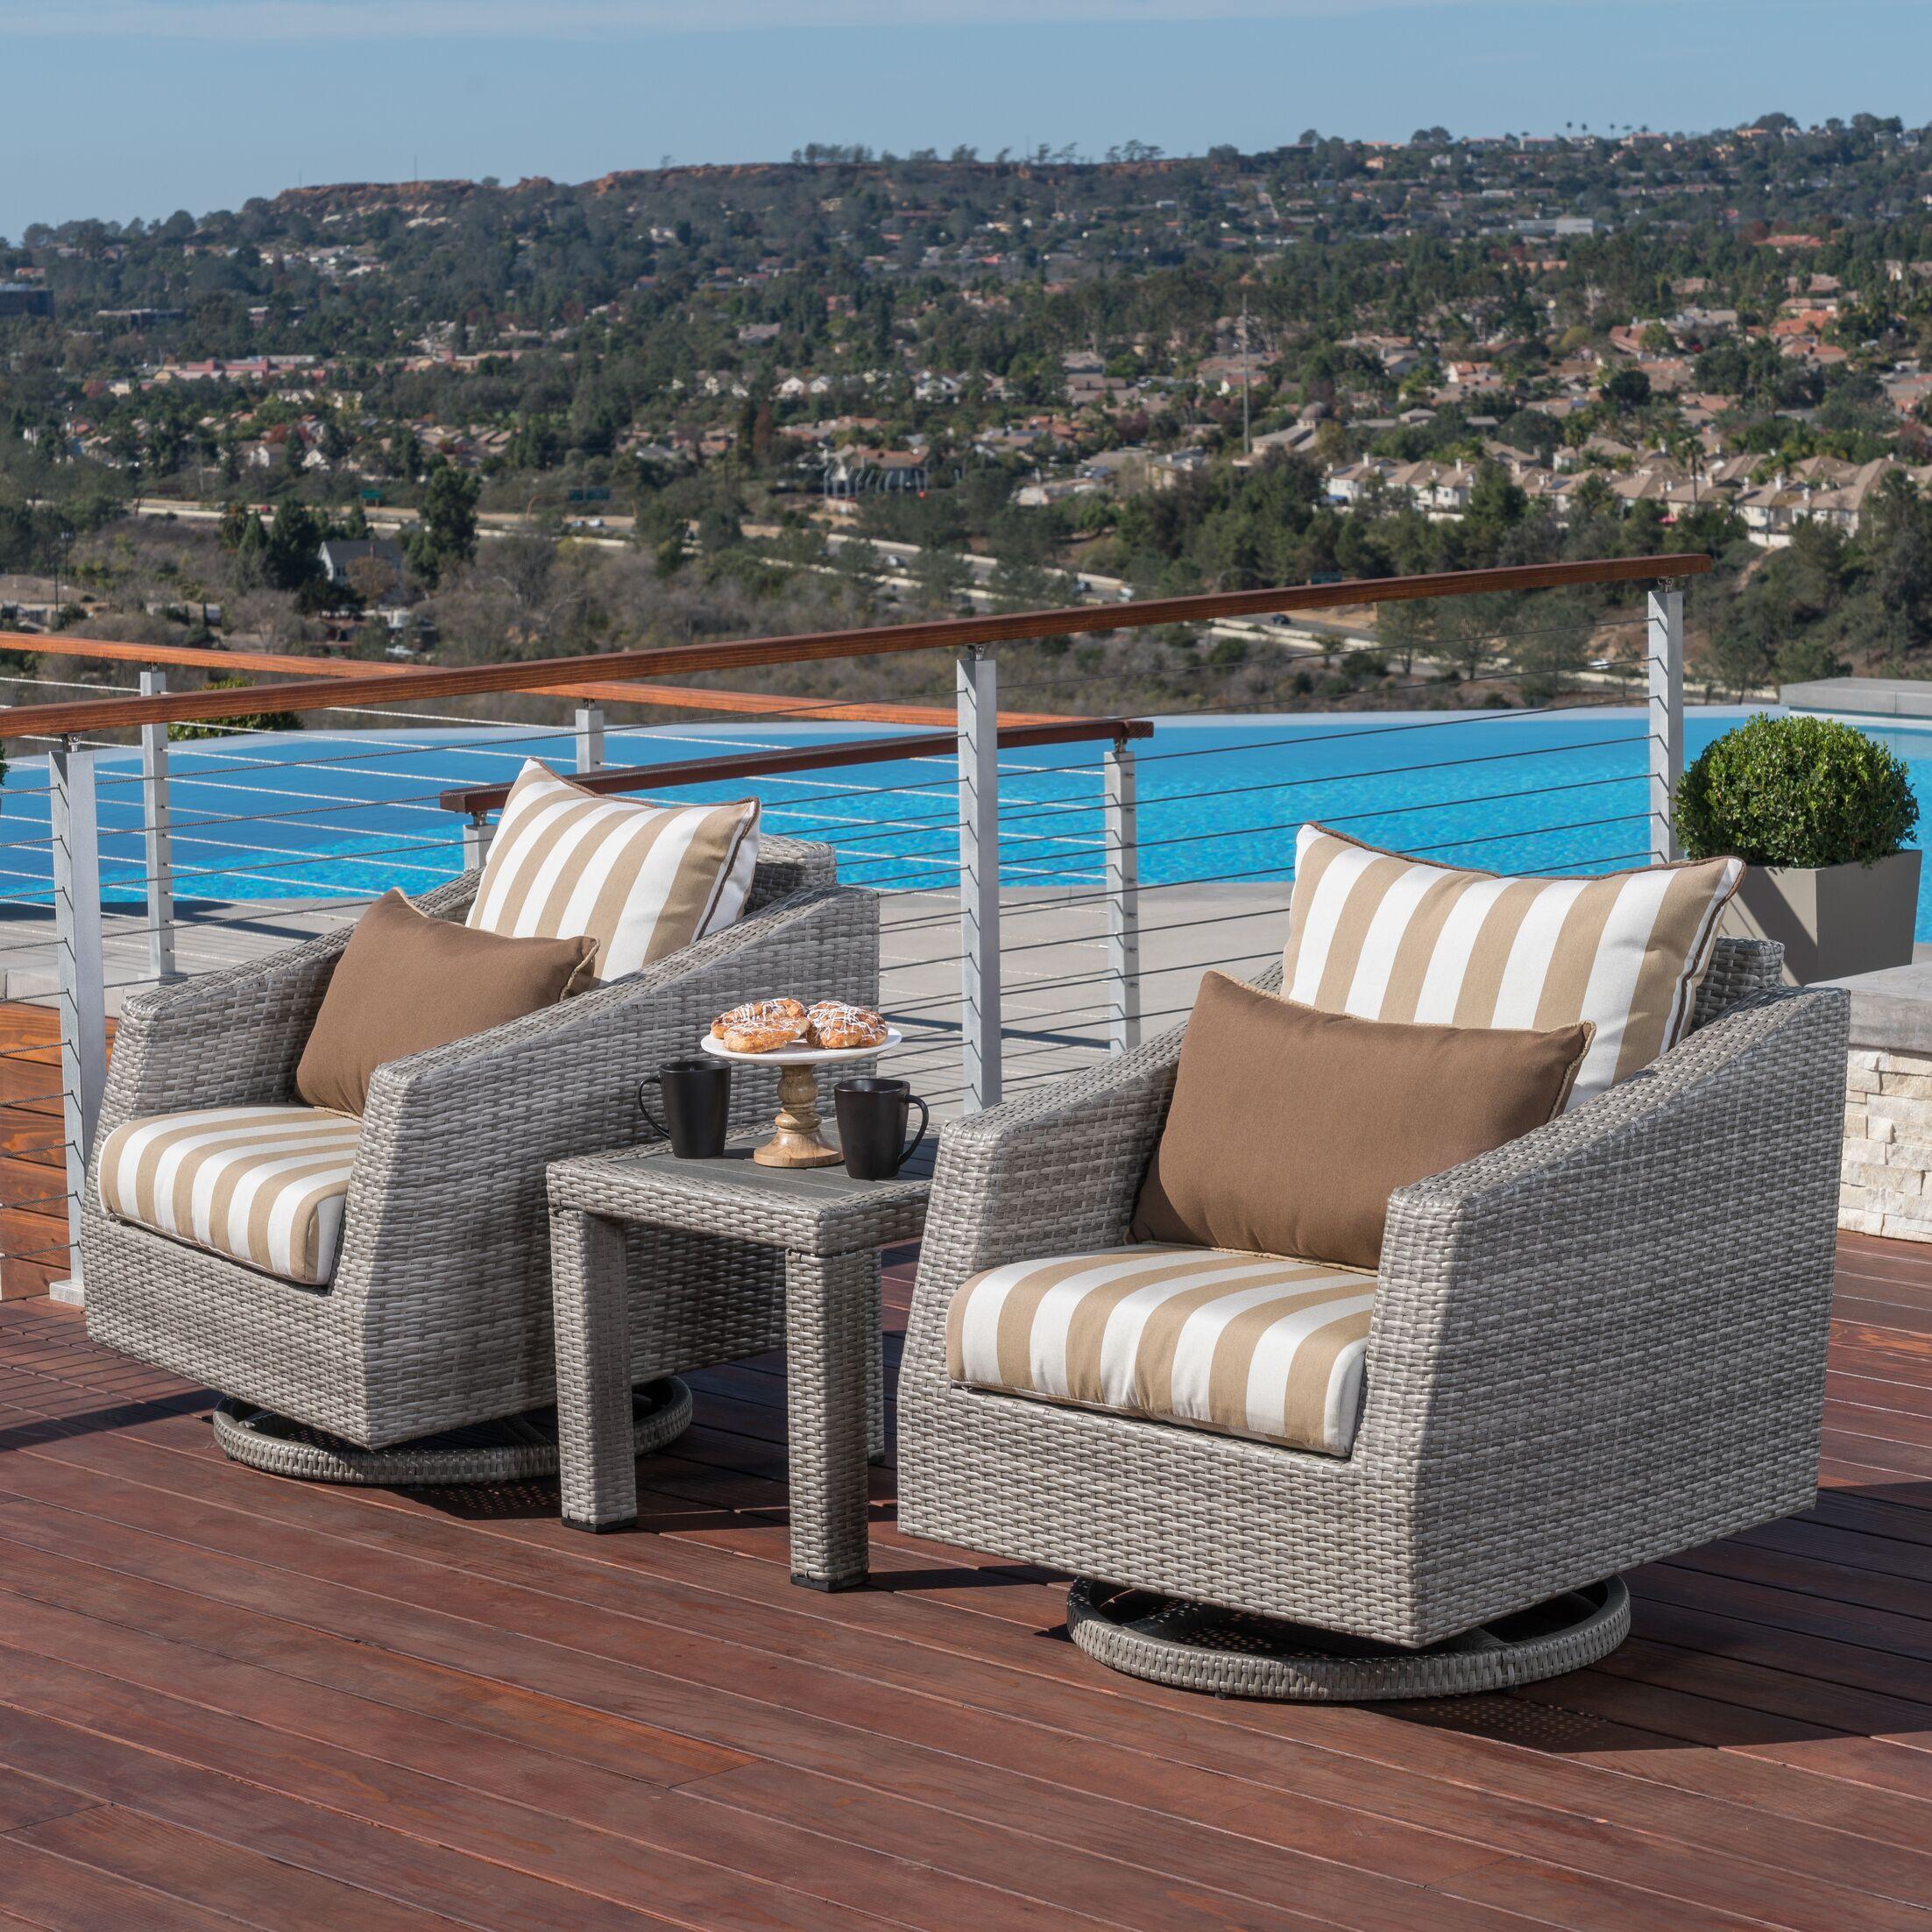 Greenfield Deluxe 3 Piece Sunbrella Conversation Set with Cushions Fabric: Maxim Beige